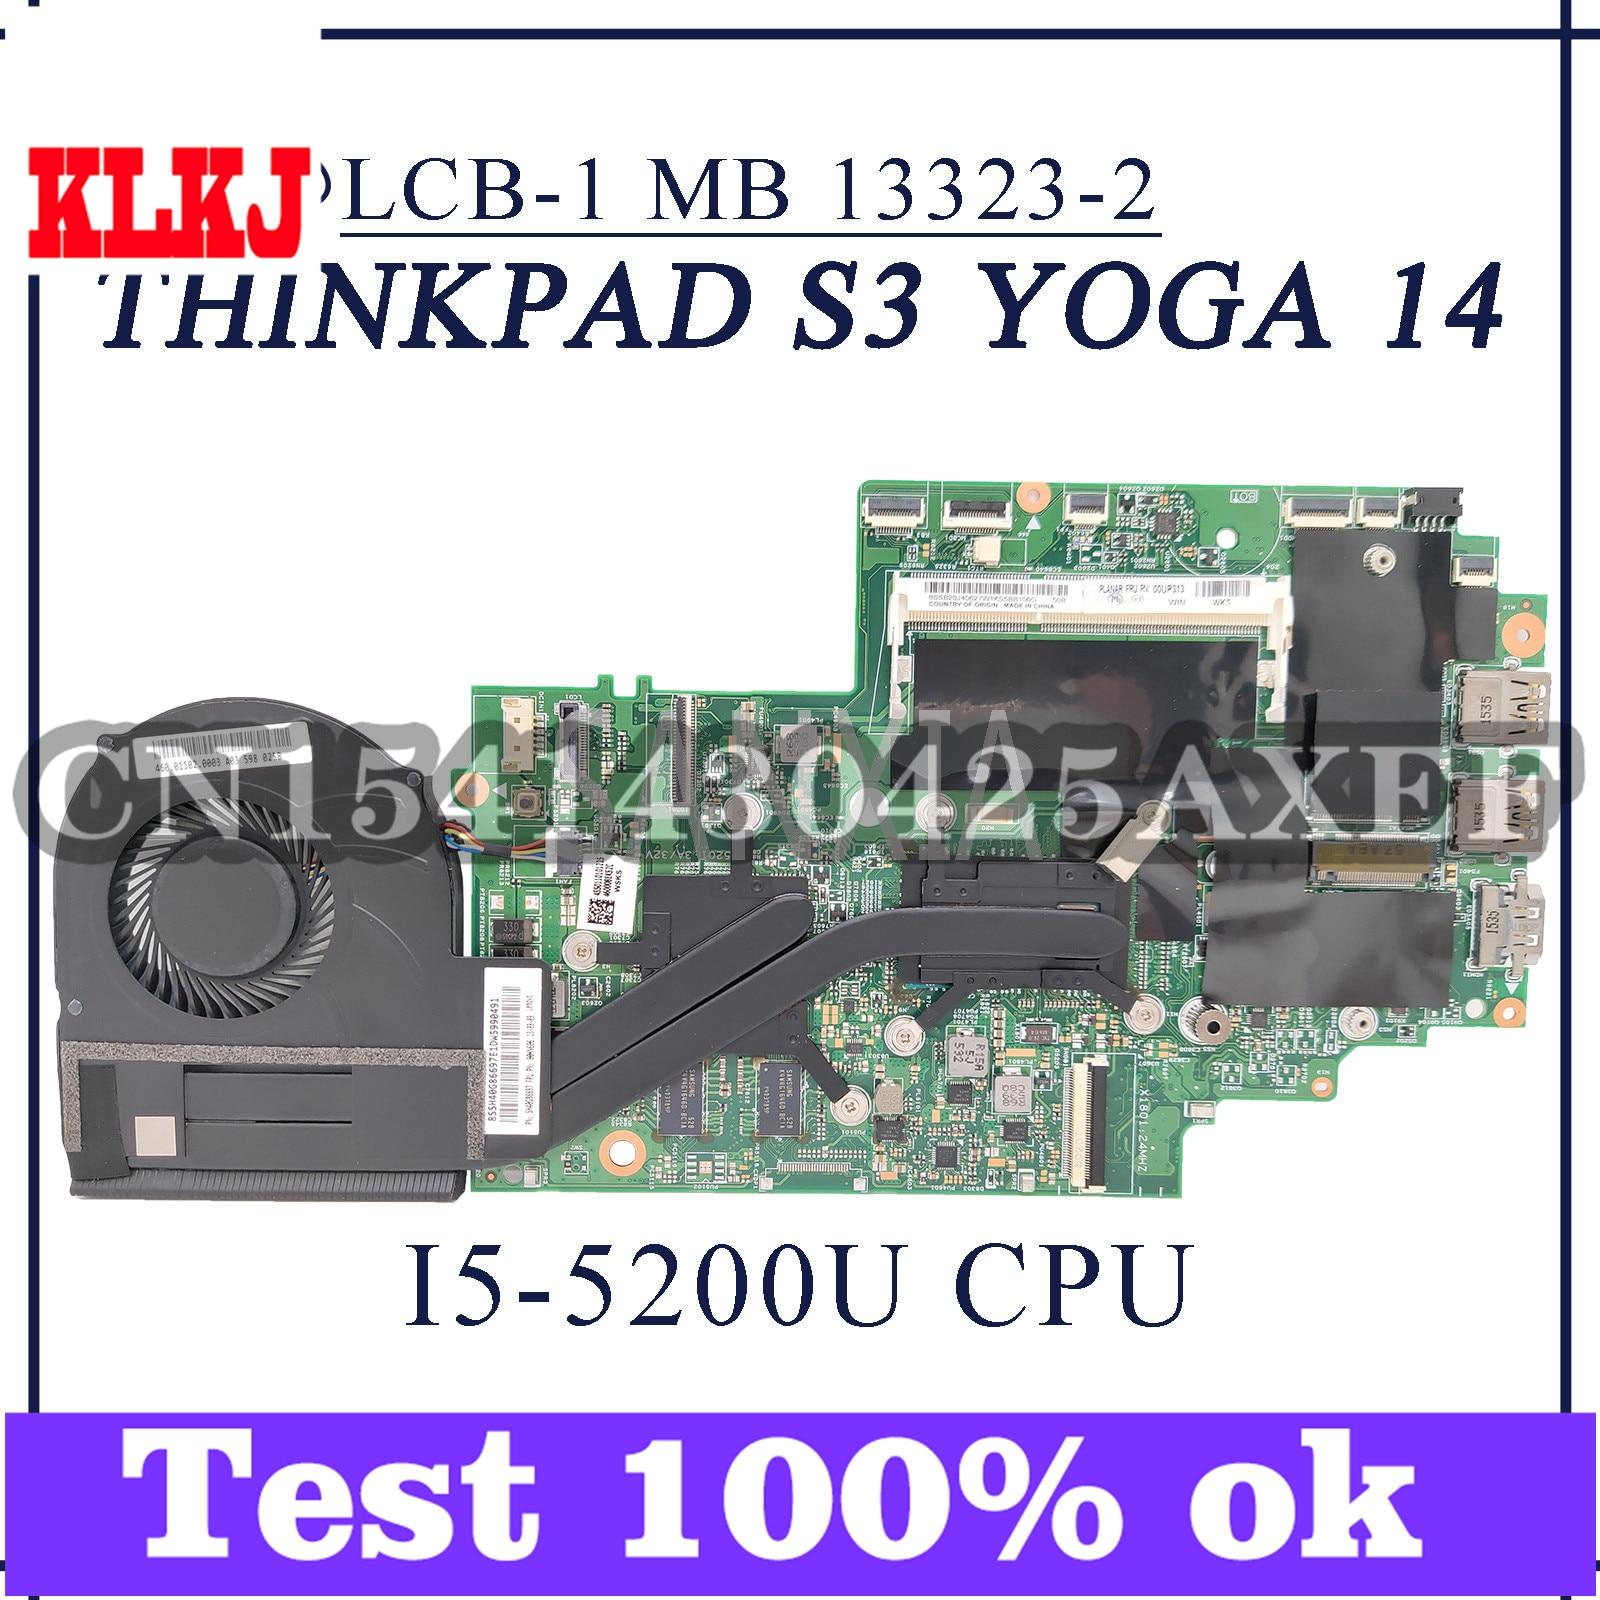 KLKJ 13323-2 اللوحة الأم للكمبيوتر المحمول لينوفو ثينك باد S3 اليوغا 14 اللوحة الرئيسية الأصلية I5-5200U PM